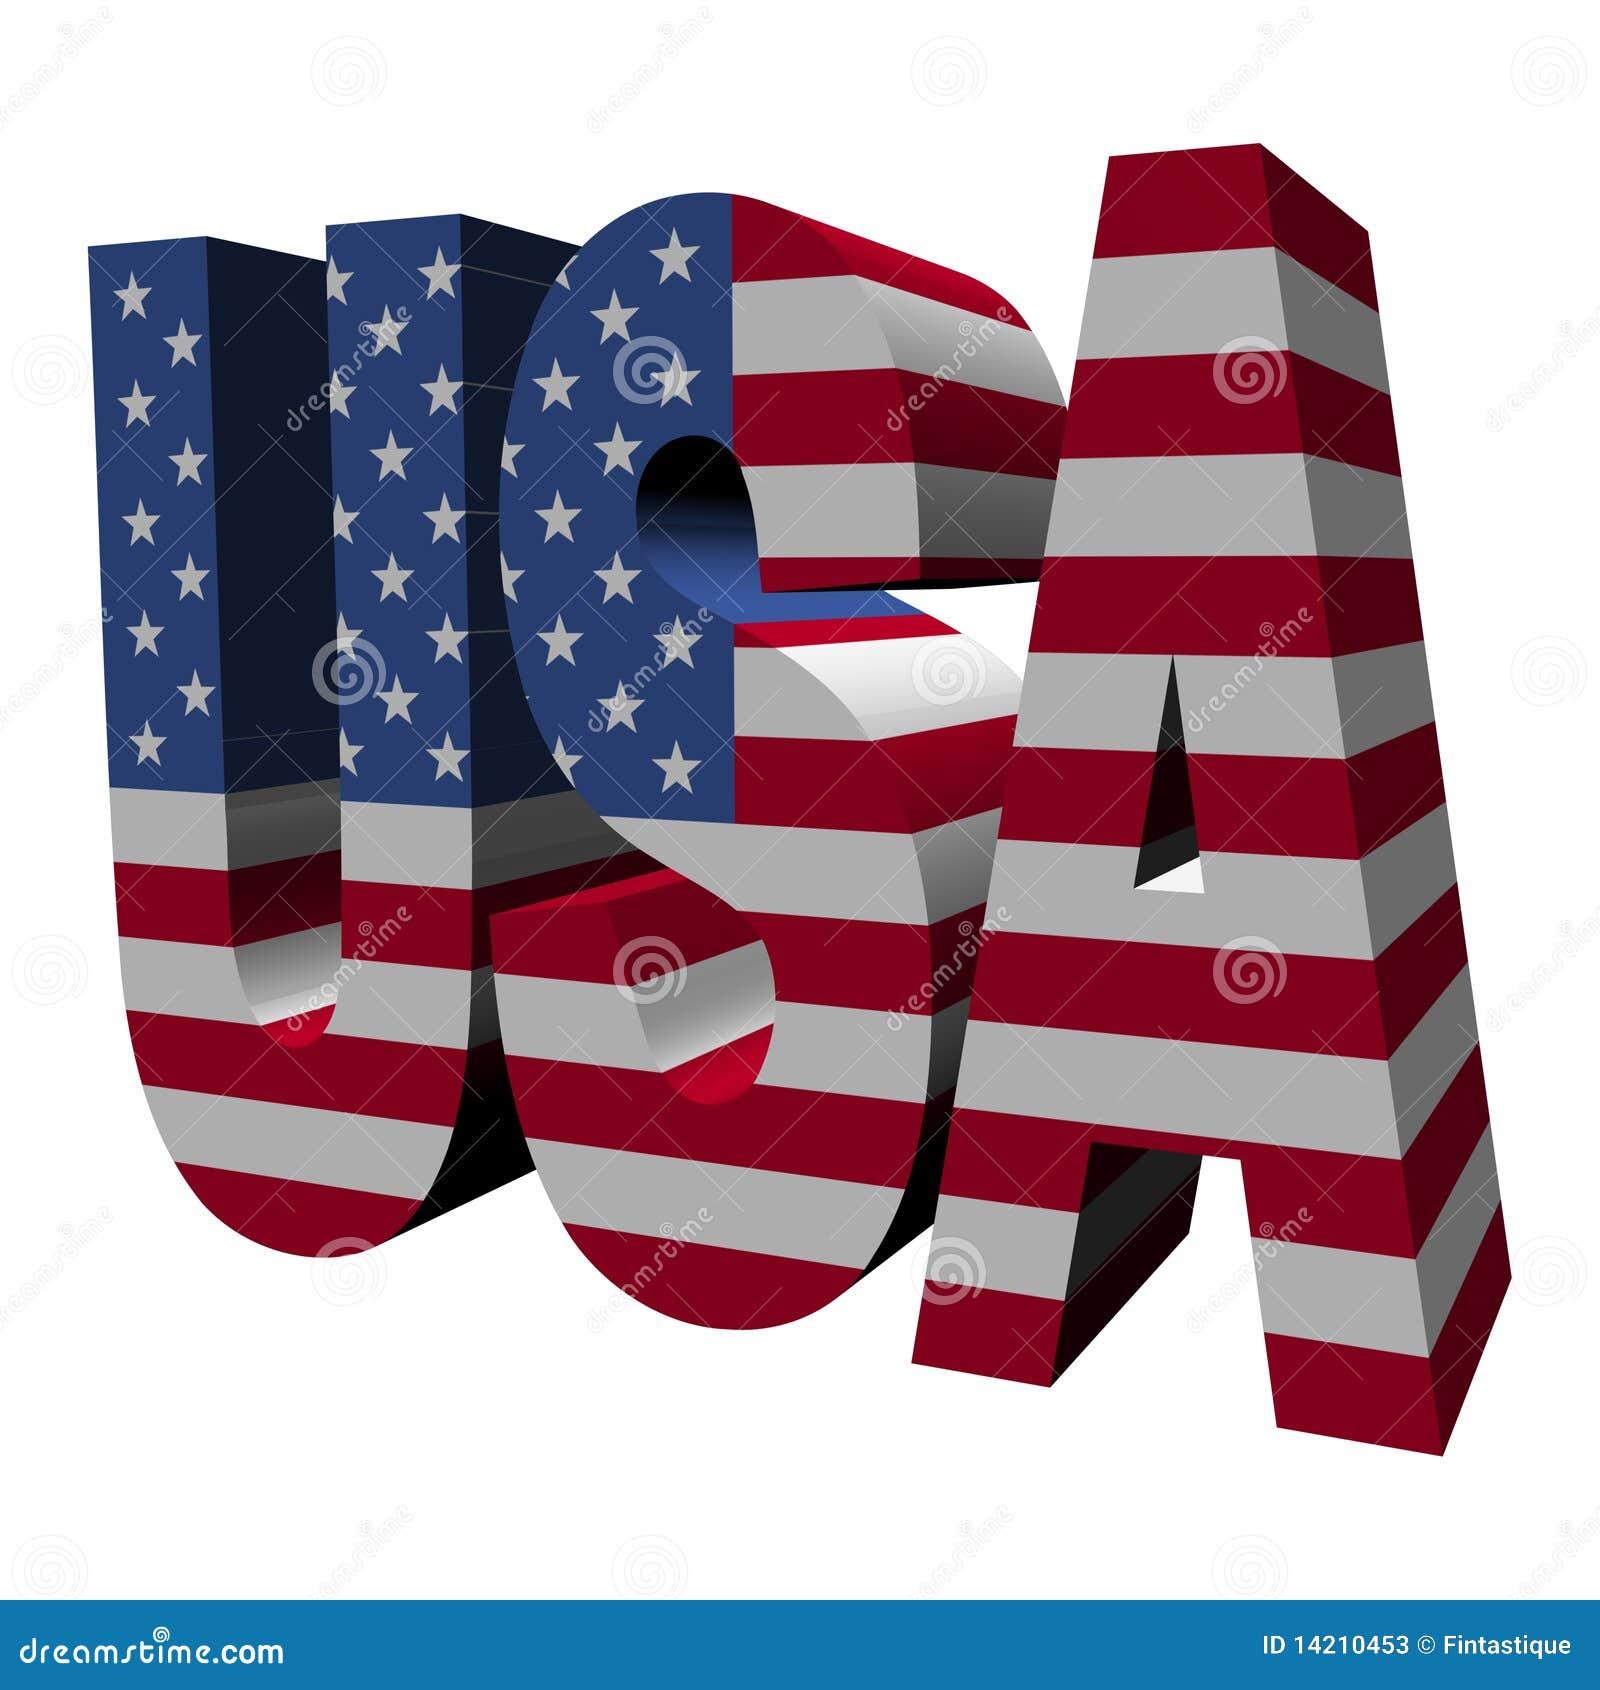 http://thumbs.dreamstime.com/z/text-usa-3d-mit-amerikanischer-flagge-14210453.jpg